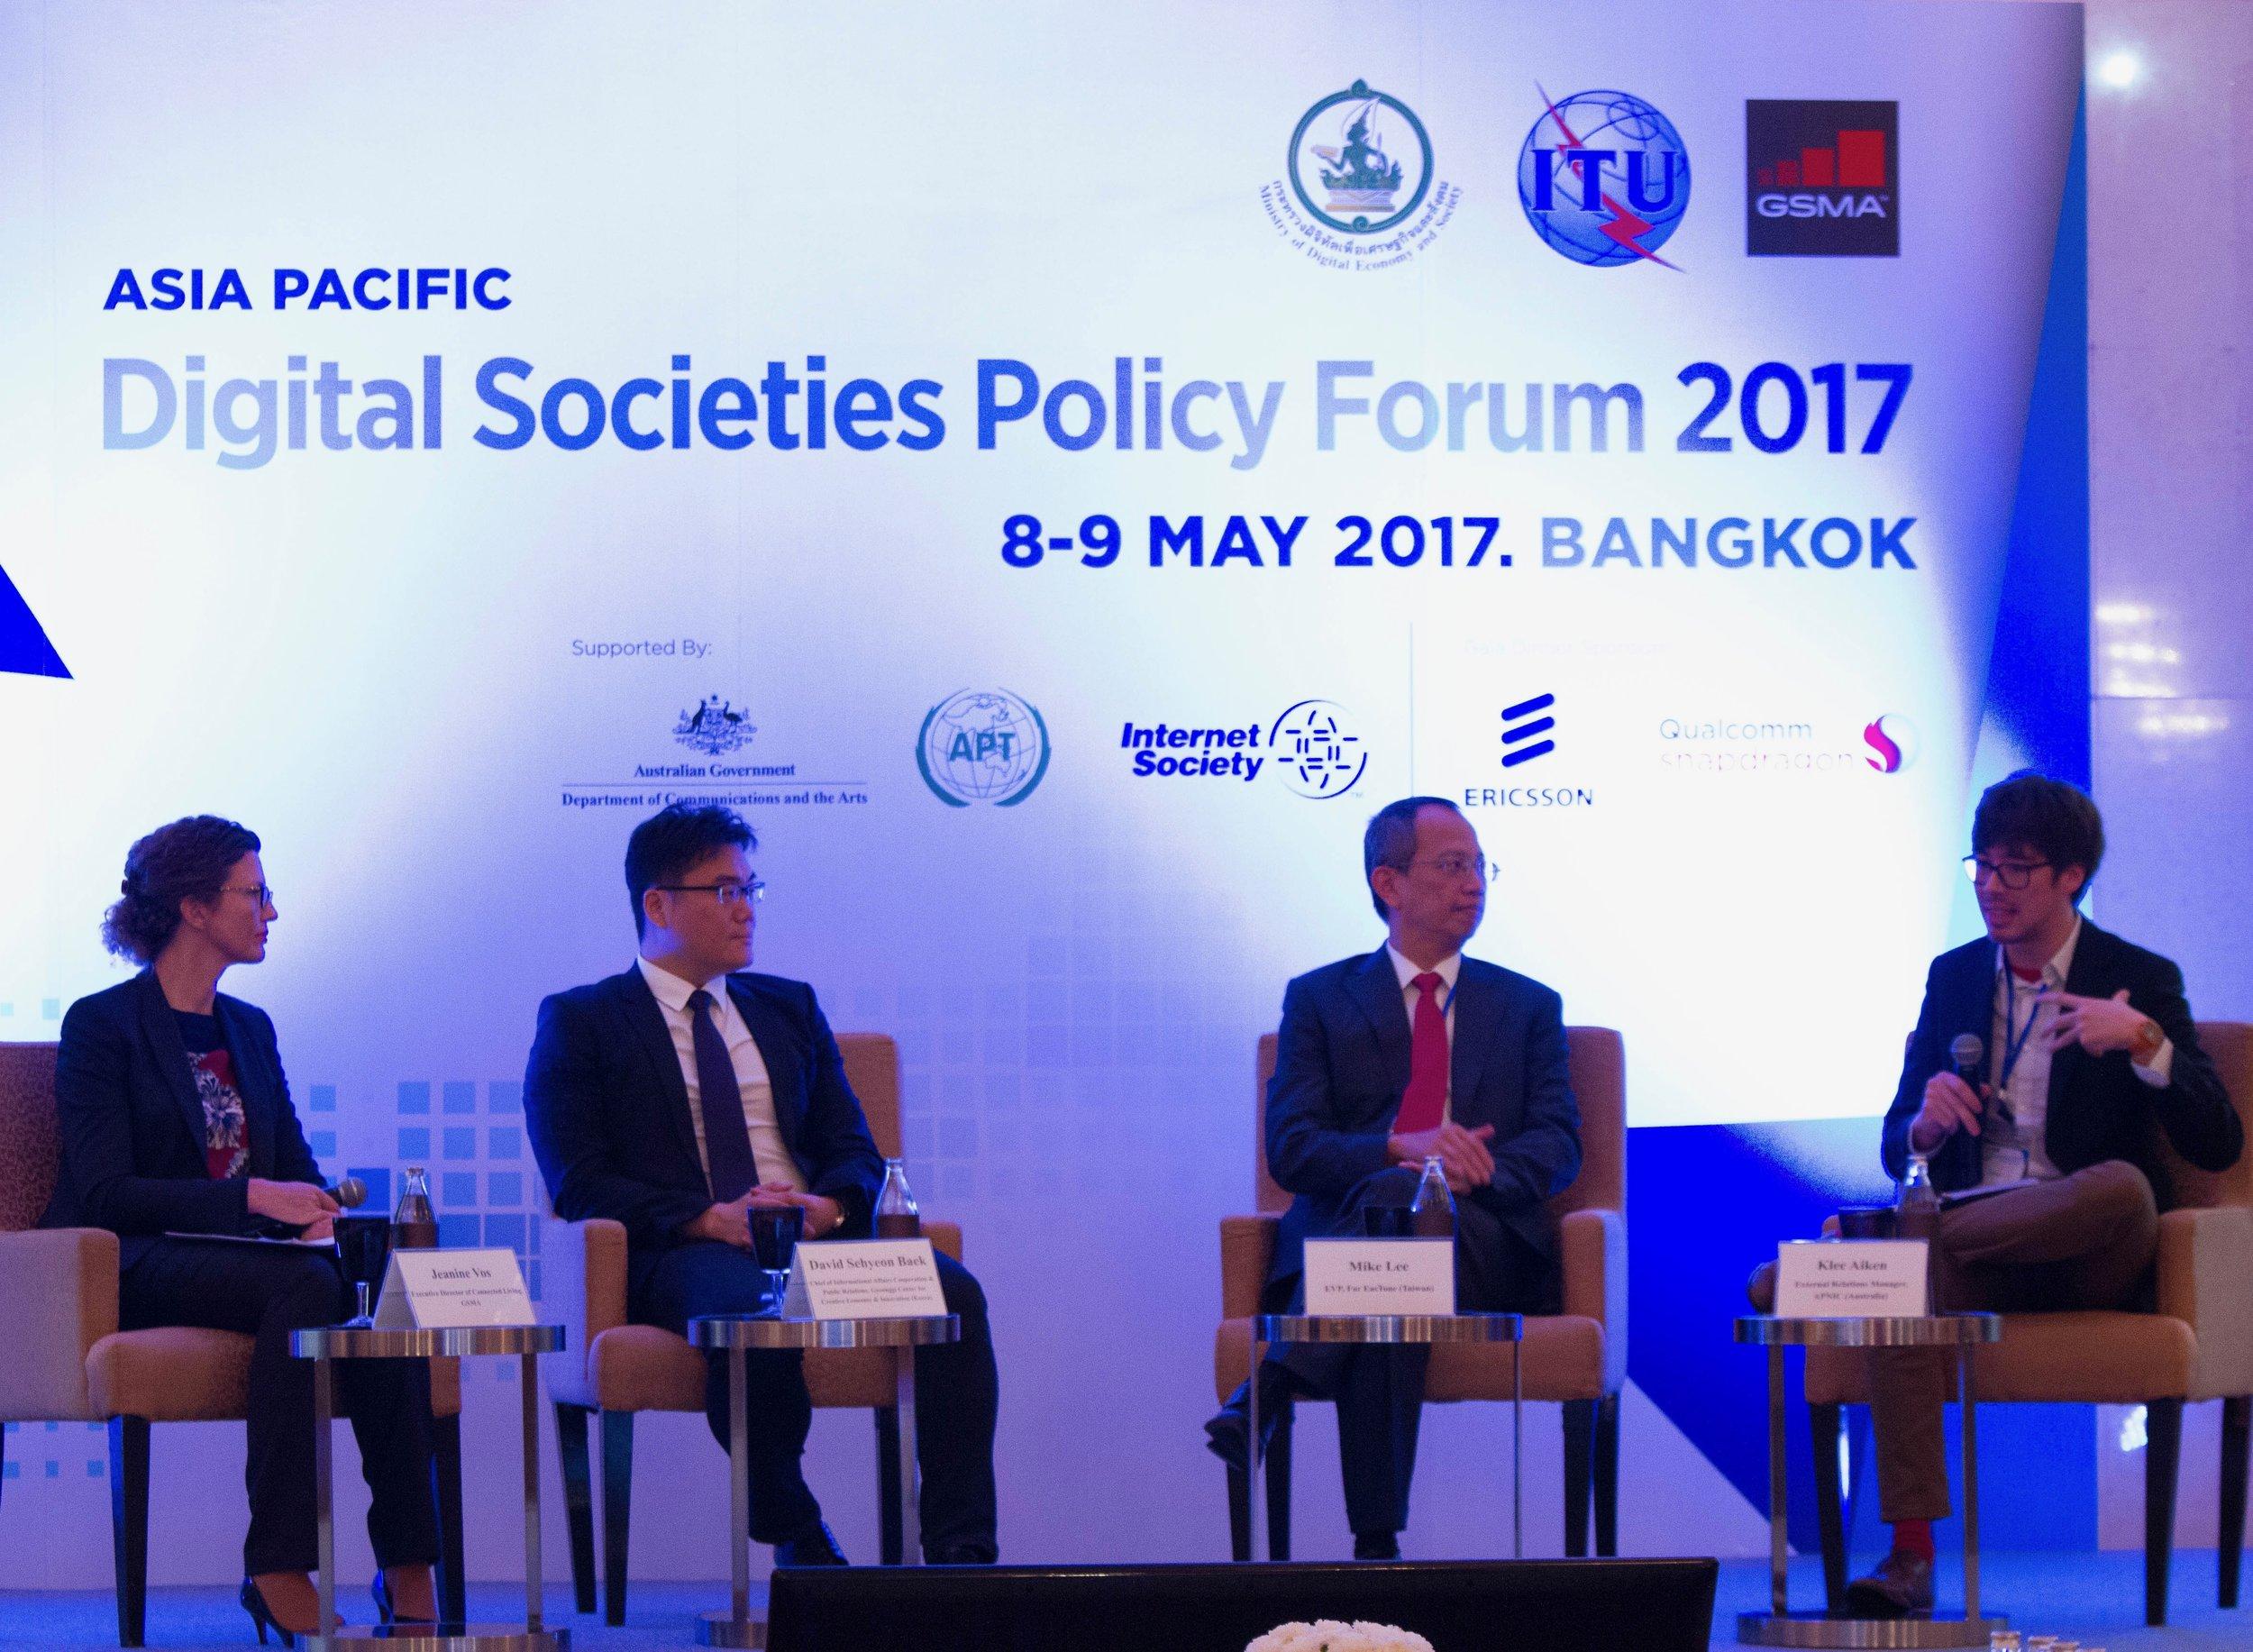 Smart City Panel at APAC Digital Societies Forum - Bangkok, TH (2017)